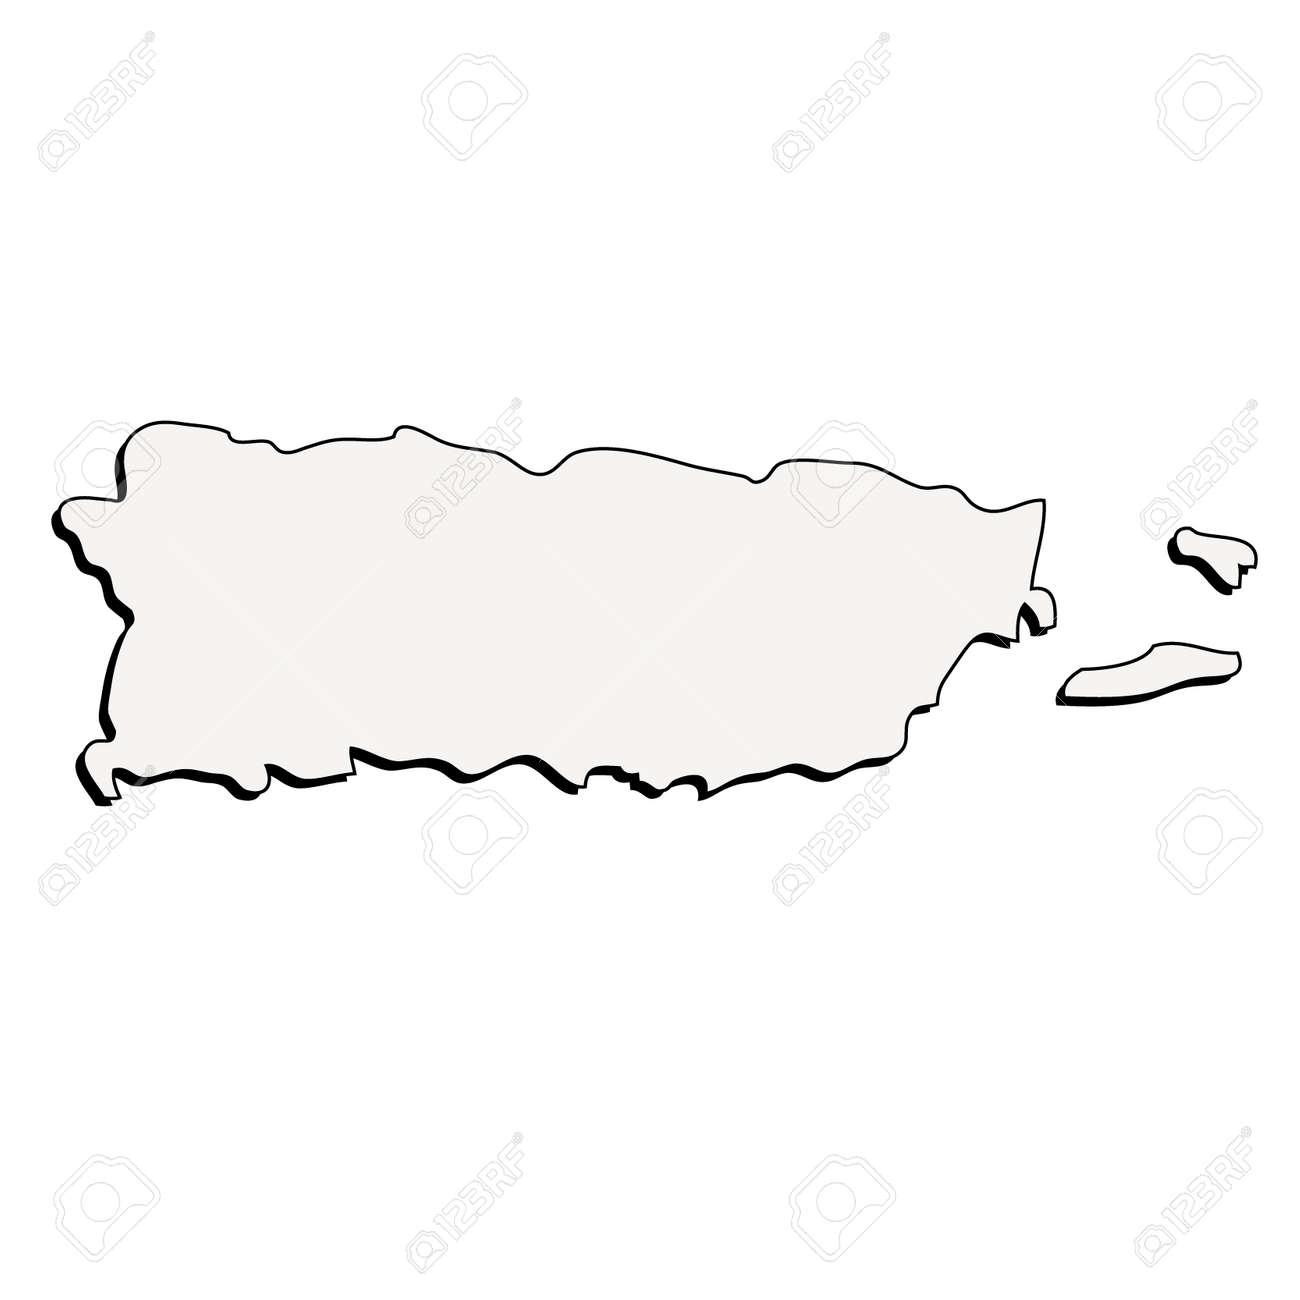 Puerto Rico 3d Outline Map